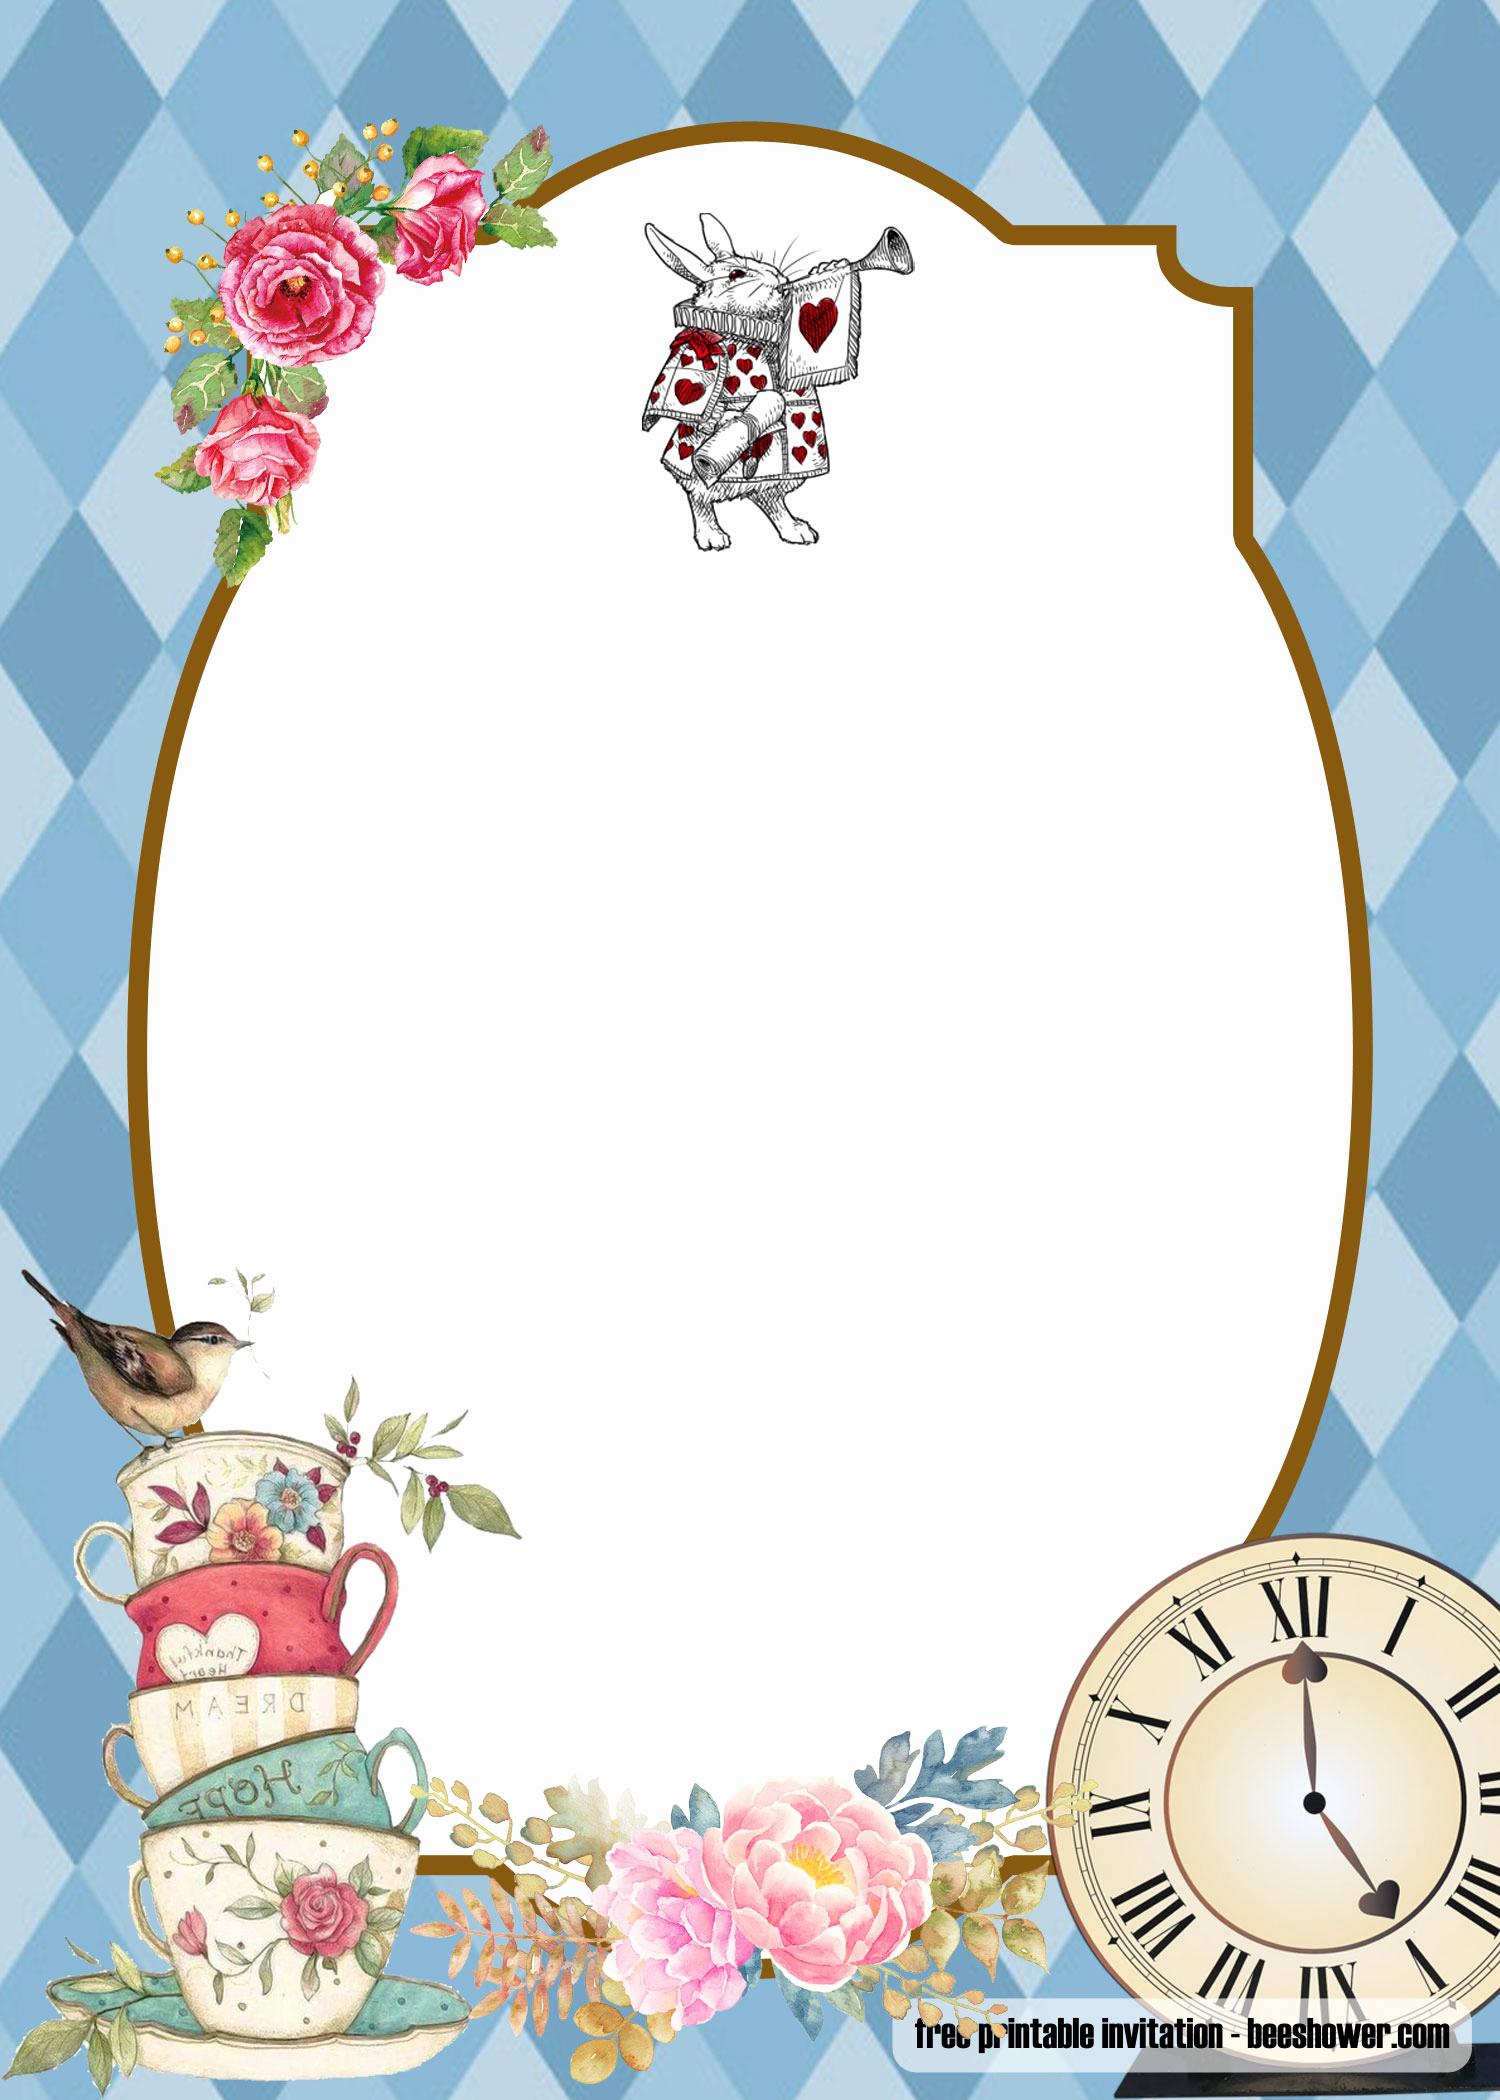 Alice In Wonderland Invitations Templates Best Of Free Alice In Wonderland Baby Shower Invitations Templates